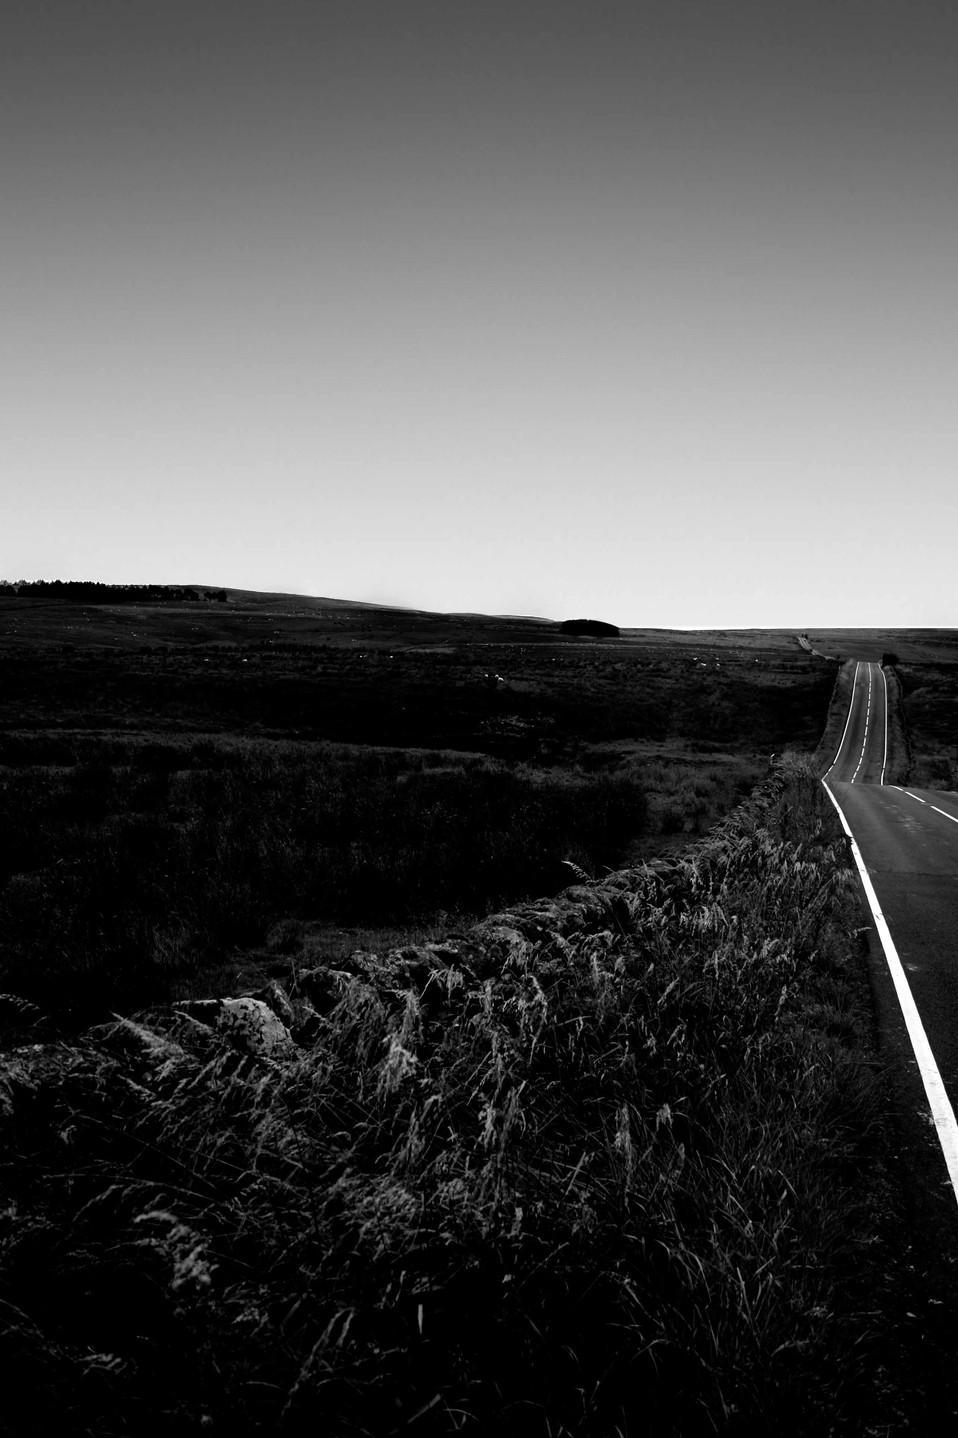 road-wall_edited-2.jpg